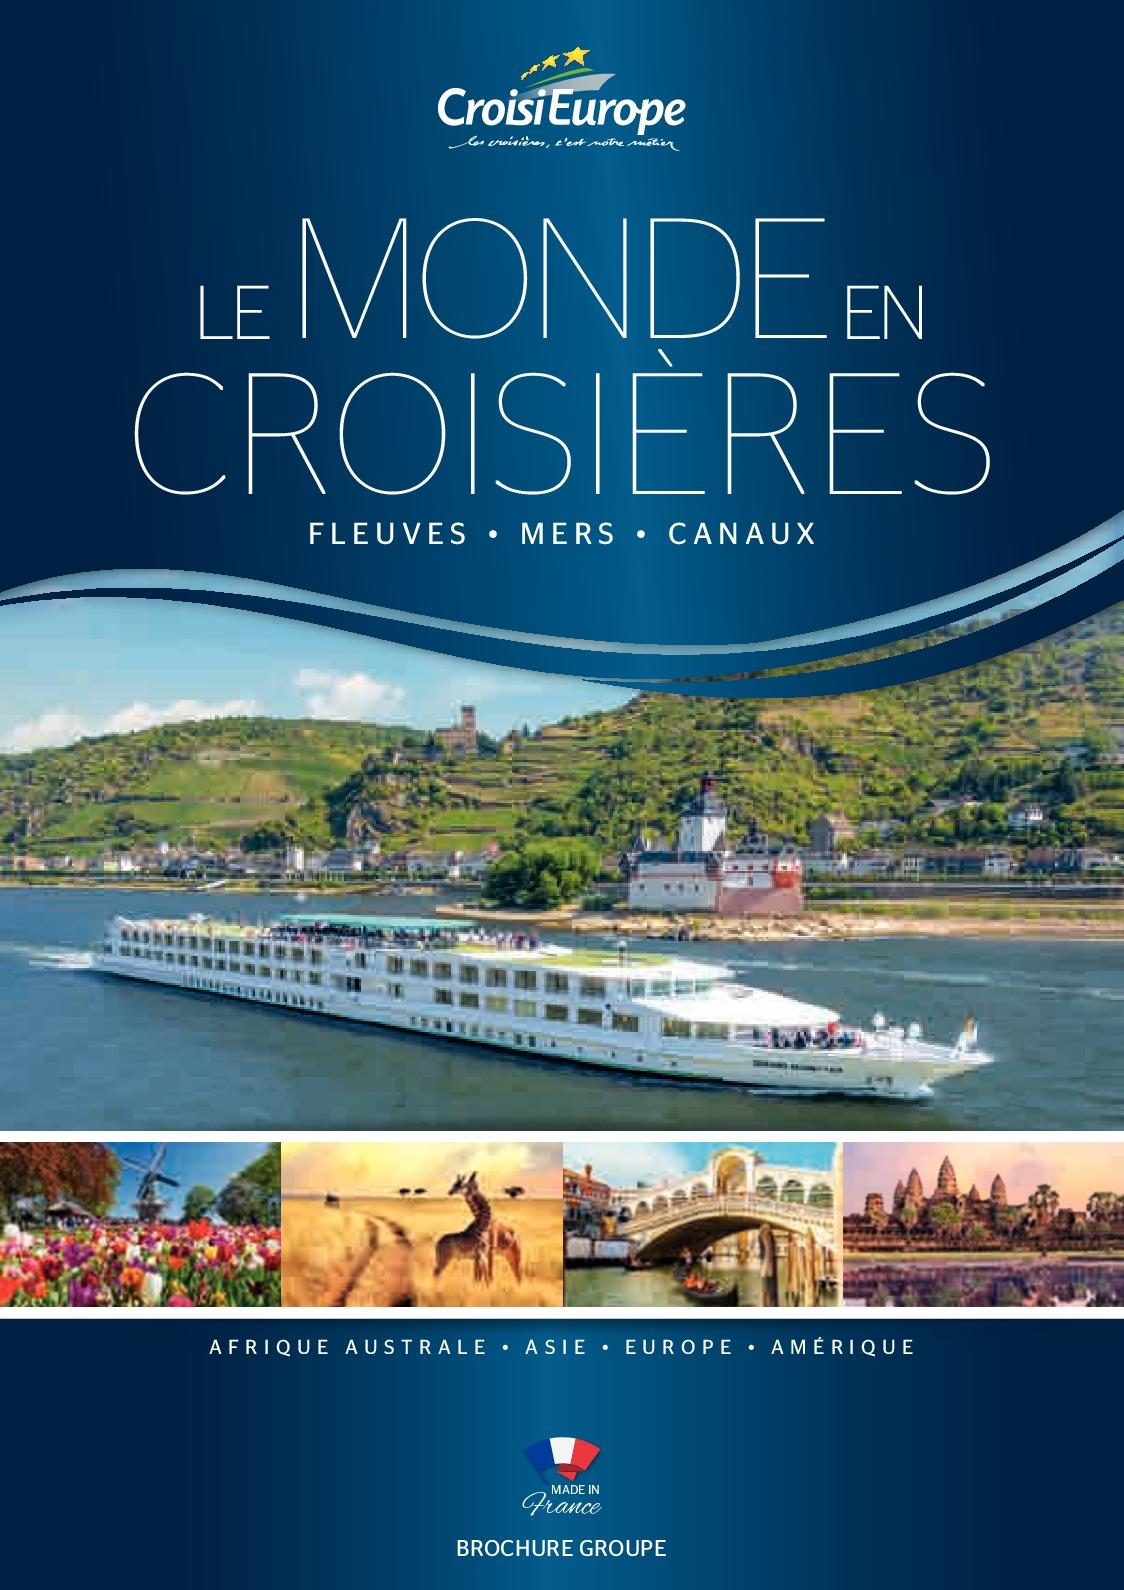 Brochure 20192020 Calaméo 20192020 Calaméo Groupe Calaméo Groupe Brochure TJ3clFK1